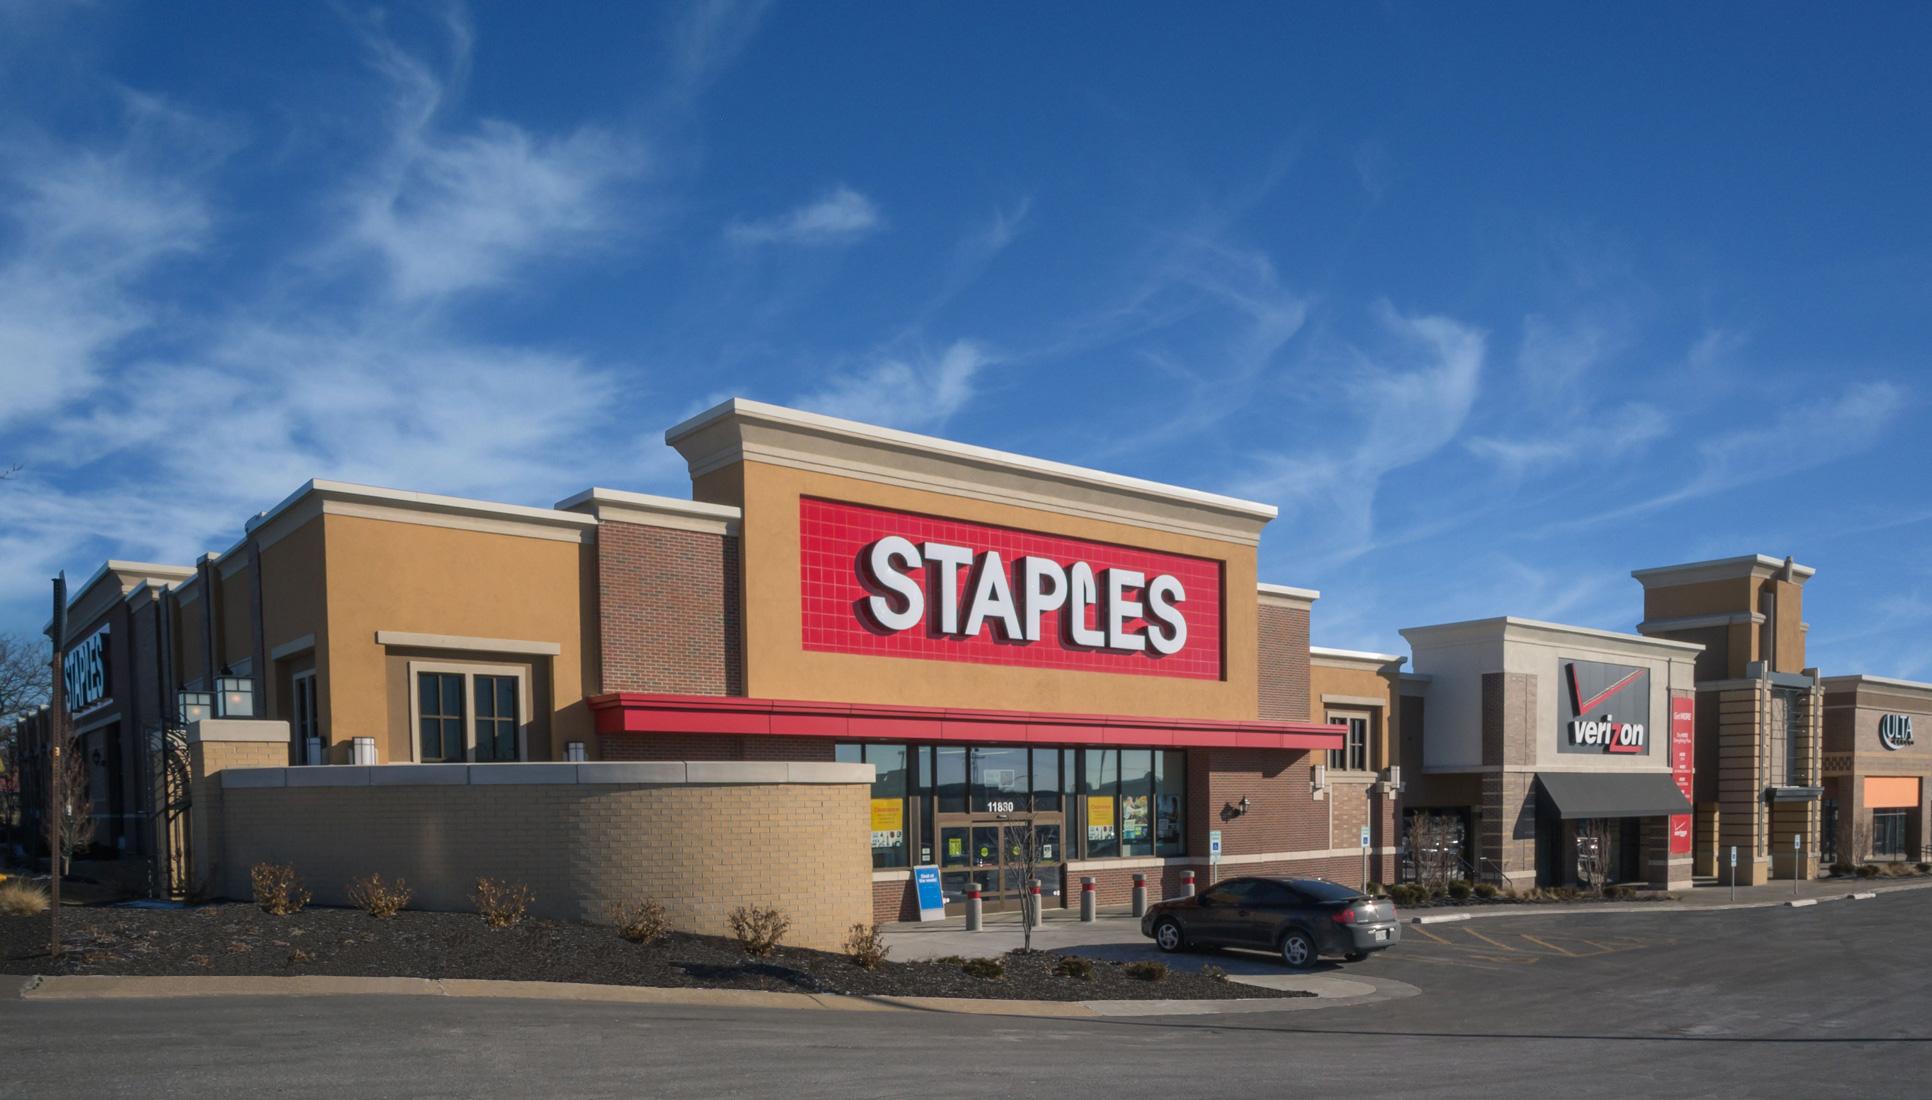 Staples — KLOVER ARCHITECTS